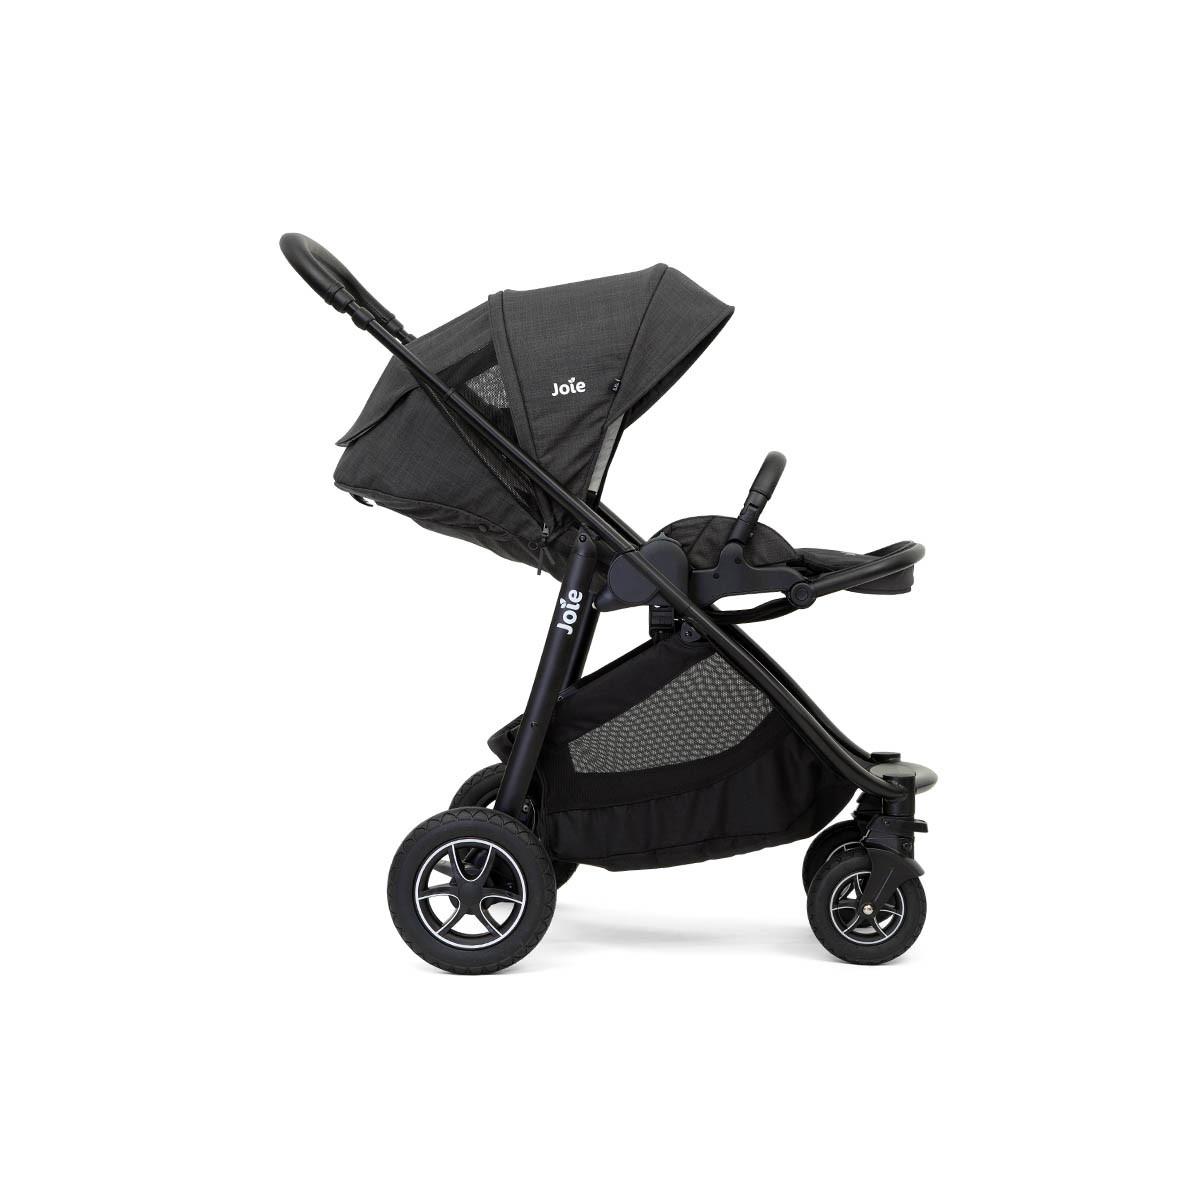 Joie kolica za bebe VERSATRAX